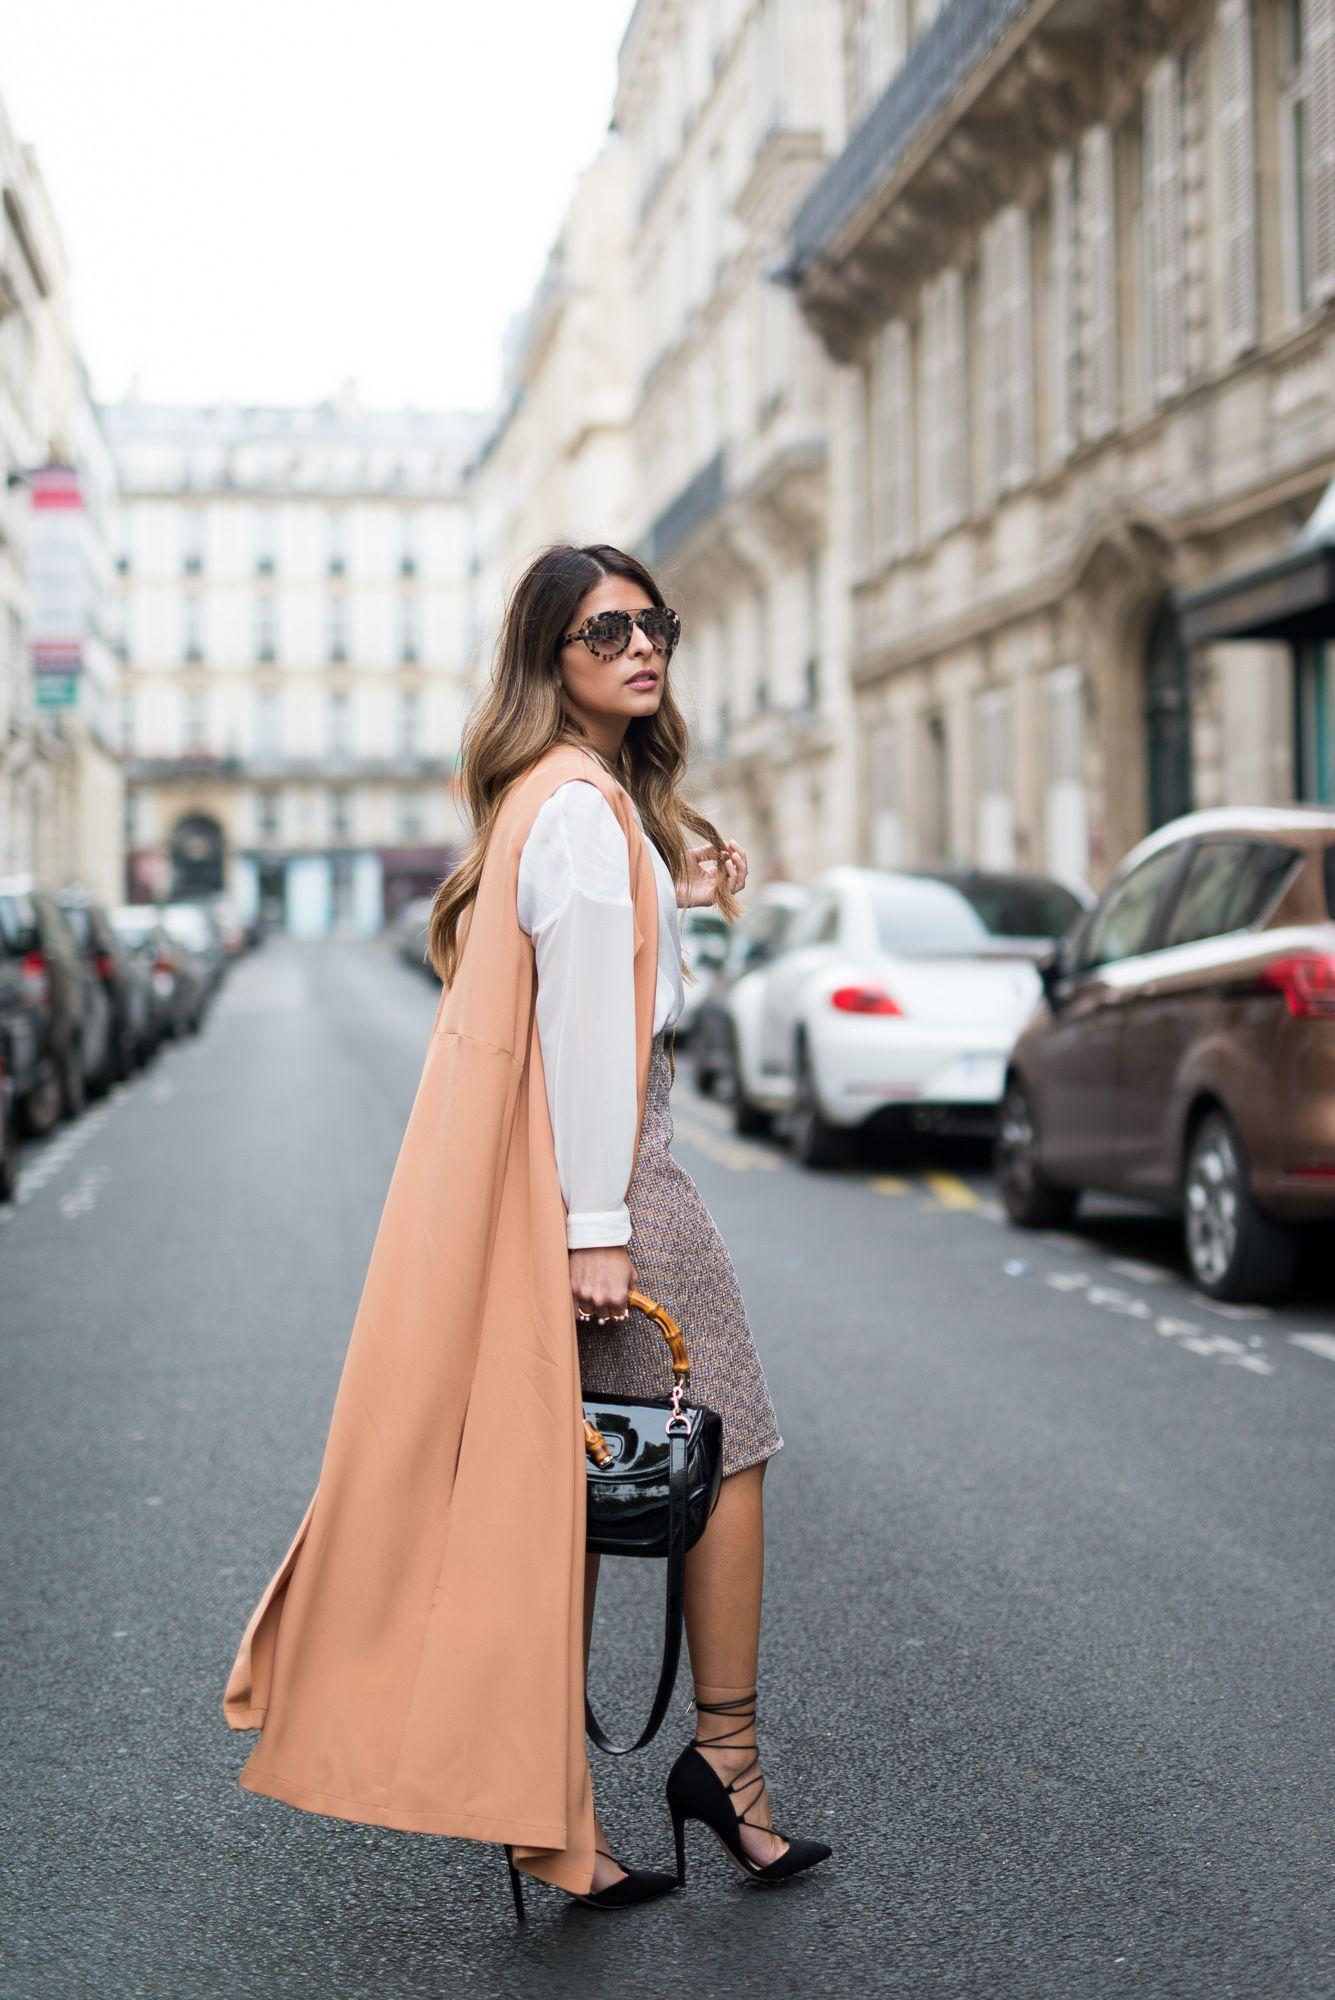 Paris-Fashion-Week-Pam-Hetlinger-The-Kayys-Trench-Dress-J.Crew-Skirt-White-Shirt-Lace-up-Pumps